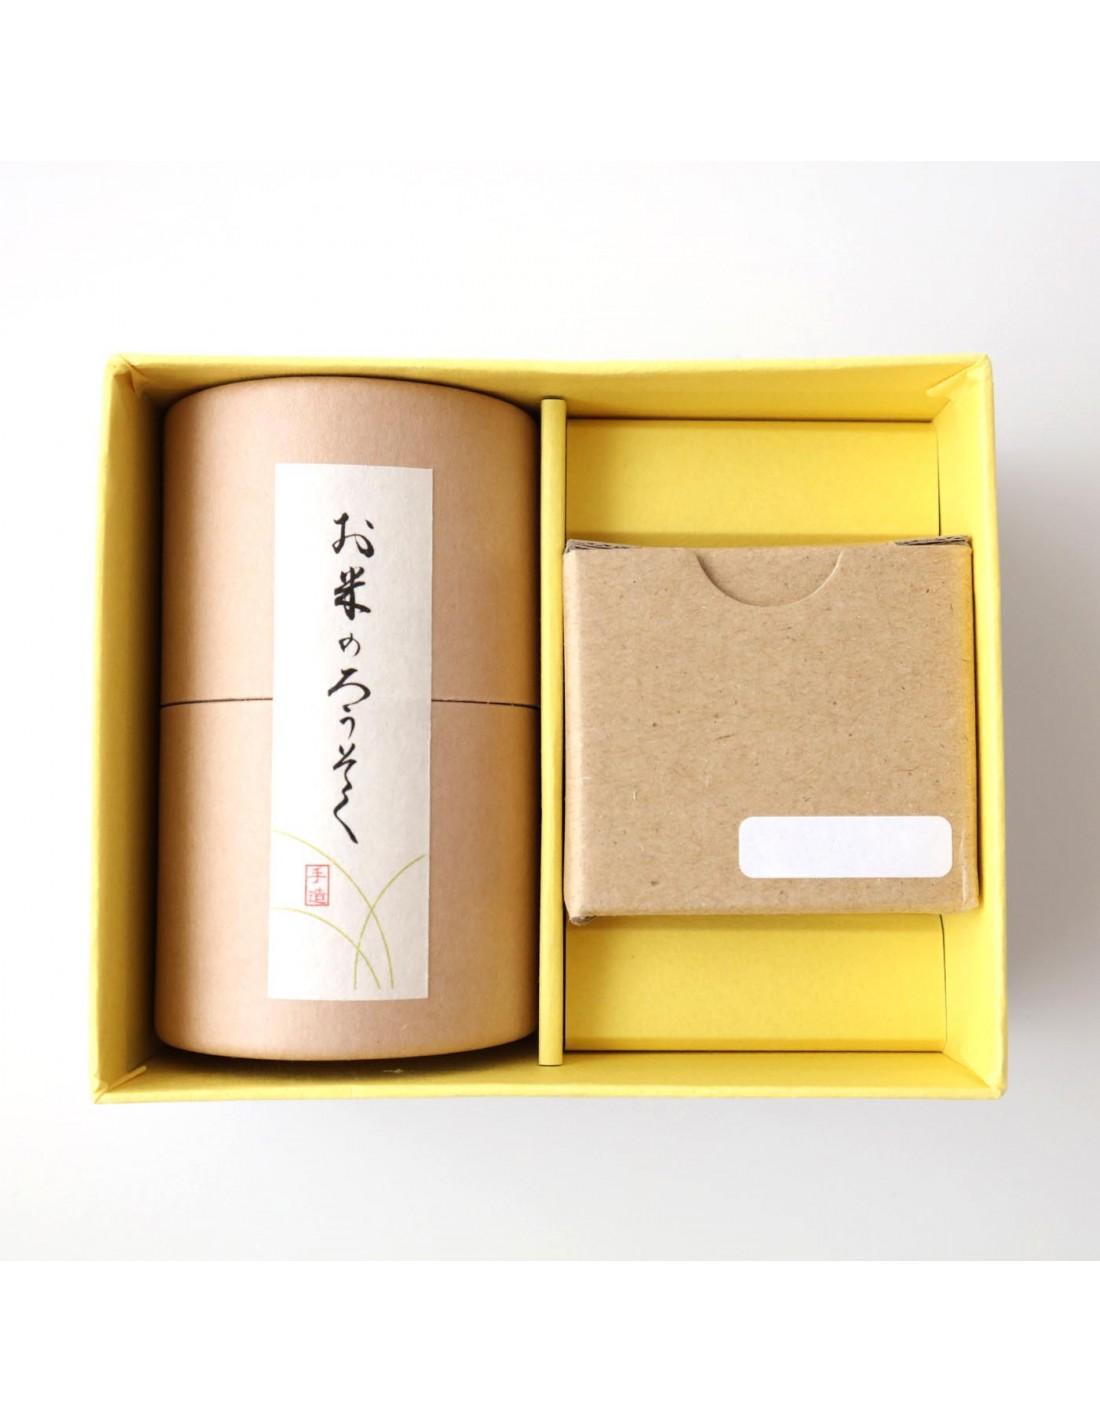 Reiswachskerzen Geschenkbox